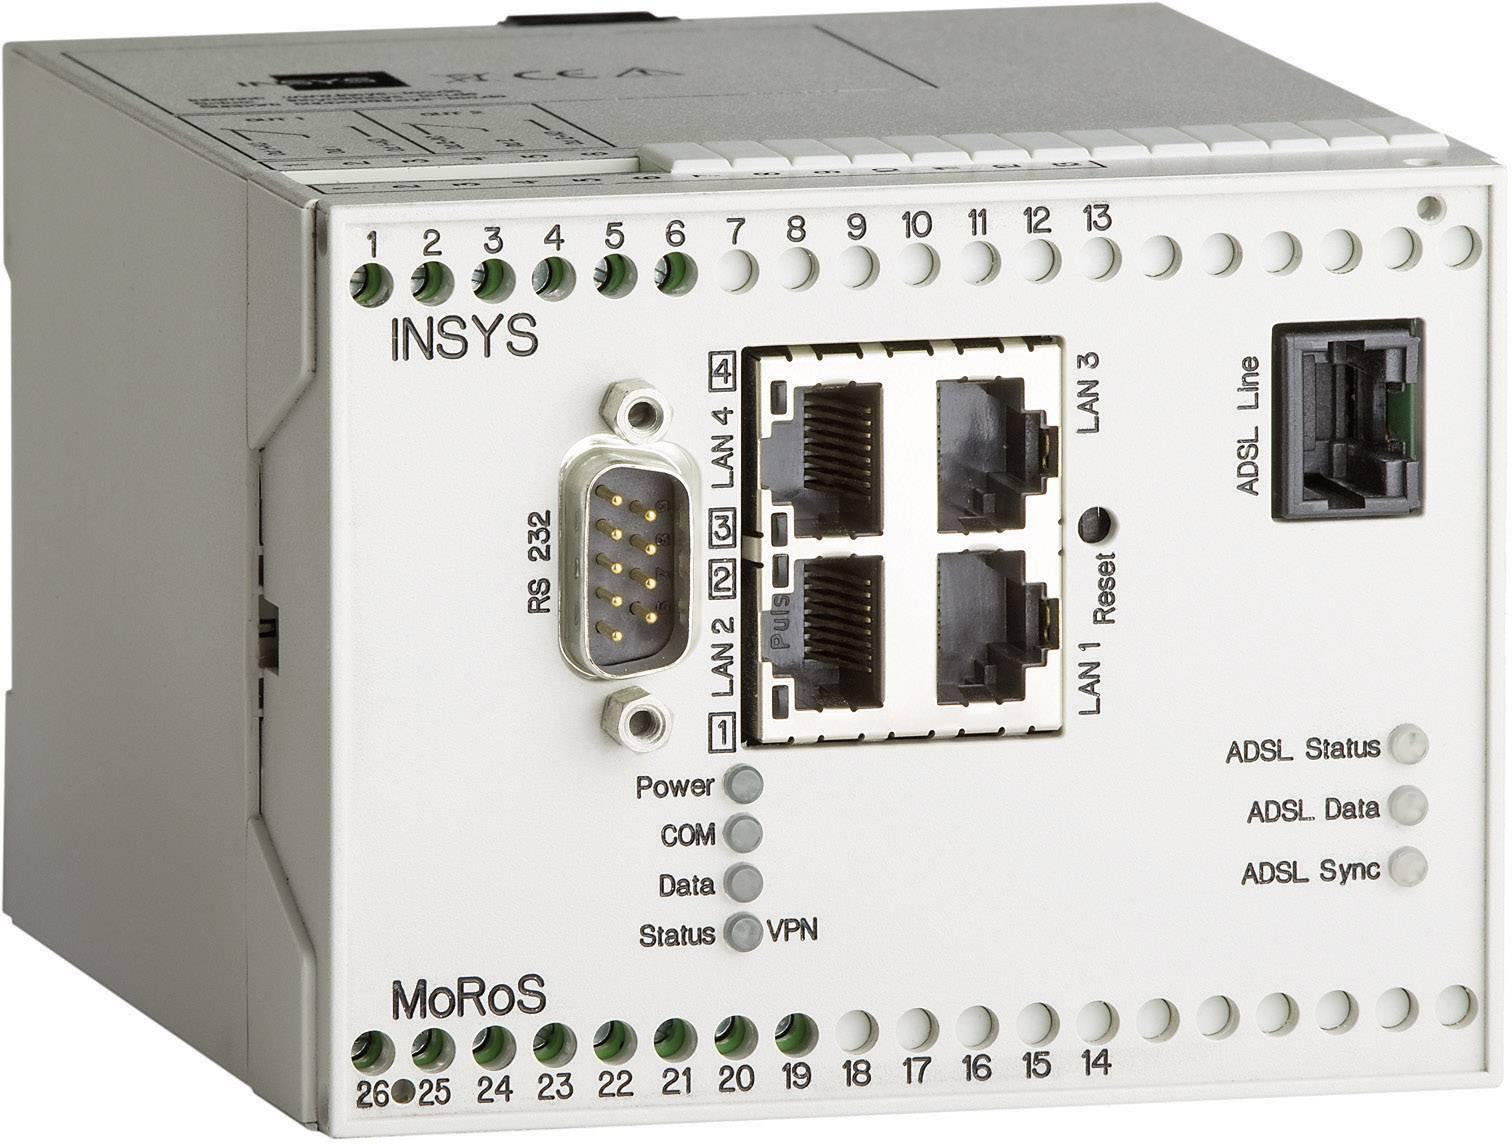 MoRoS ADSL Pro modem Insys 10000216, 110 x 100 x 75 mm